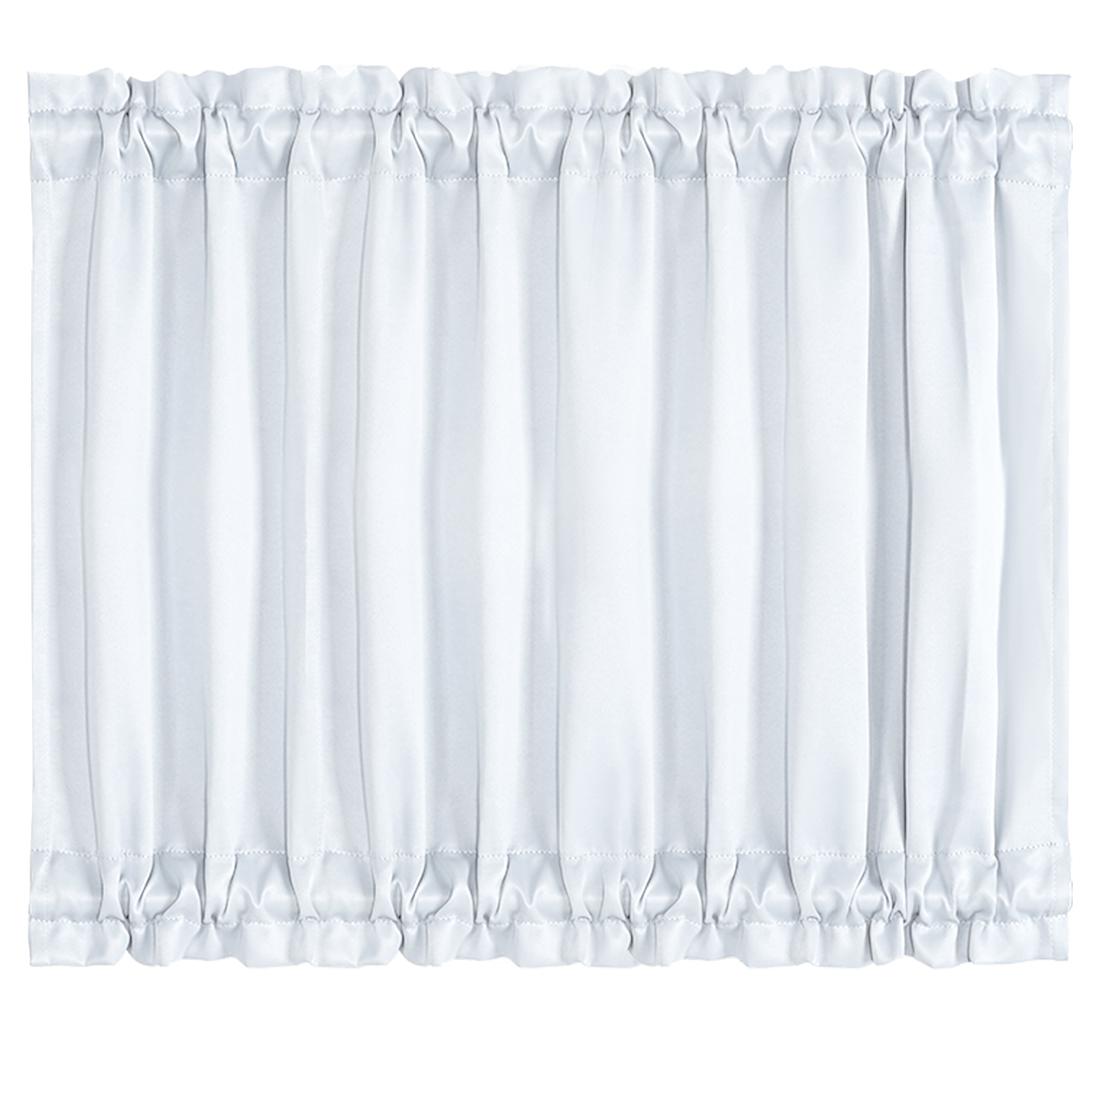 Elegant 54 x 40 Inch Blackout Curtains Rod Sliding Door Drapes Greyish White